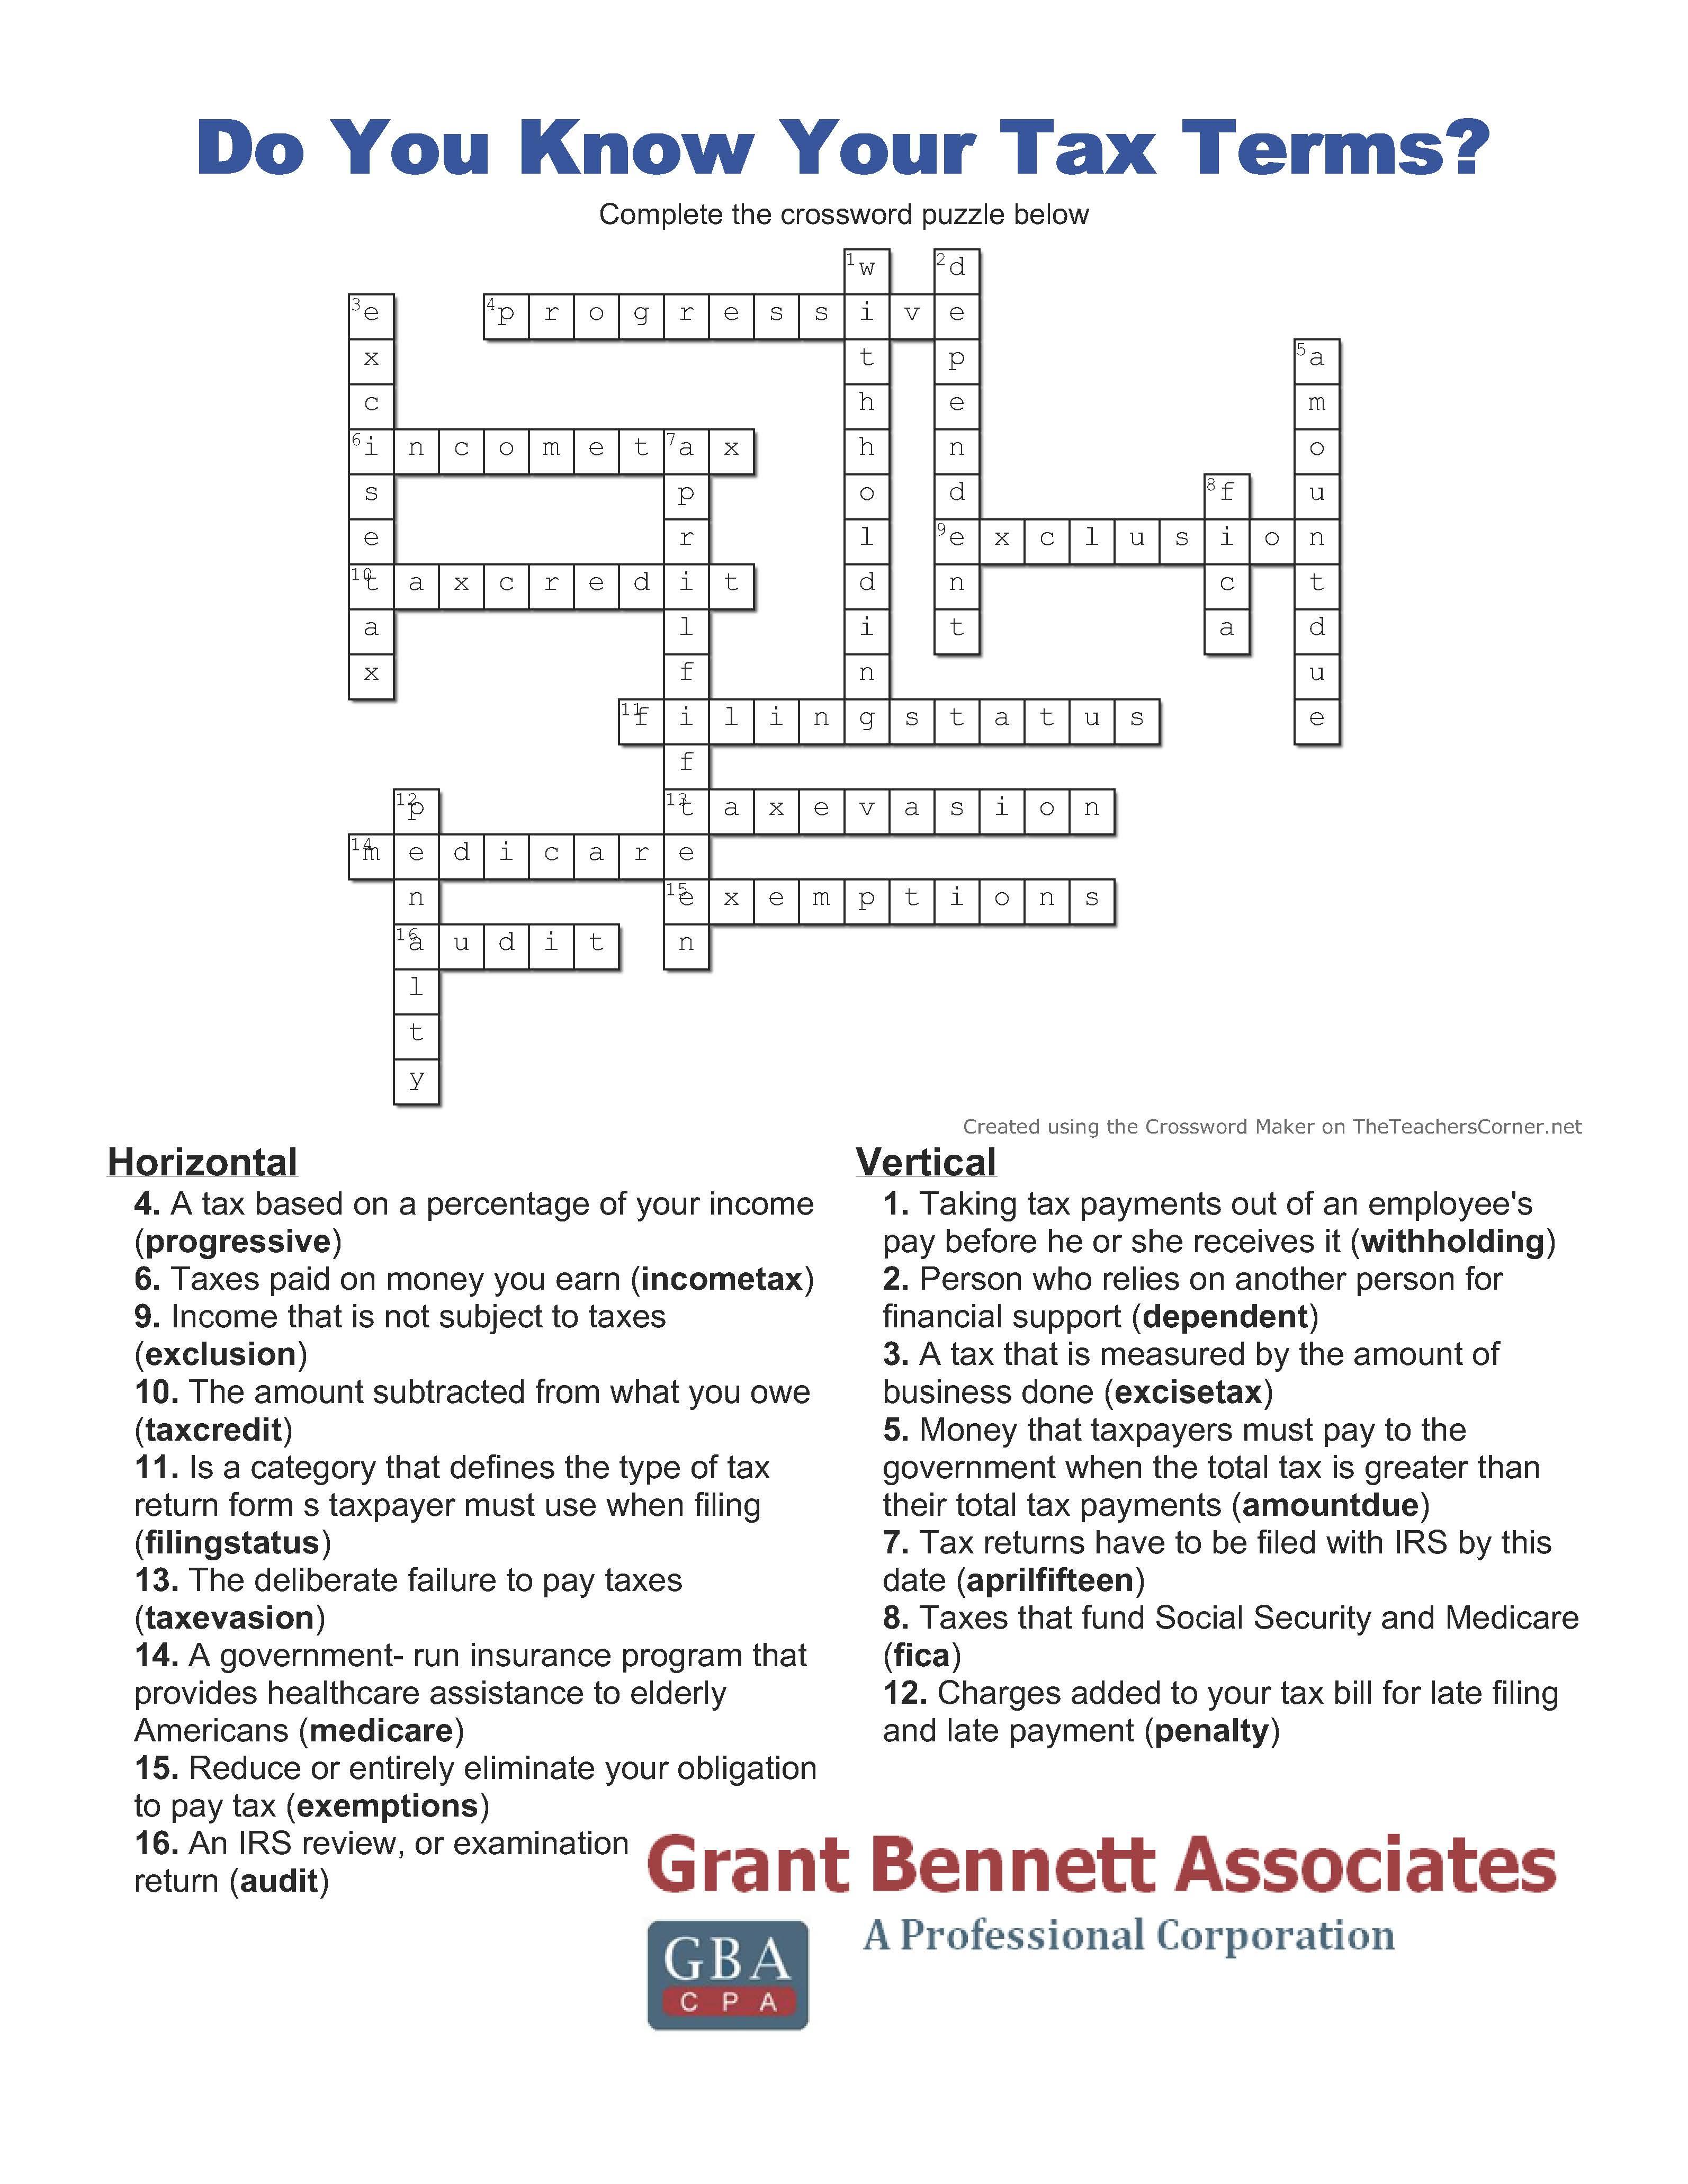 crossword_key.jpg